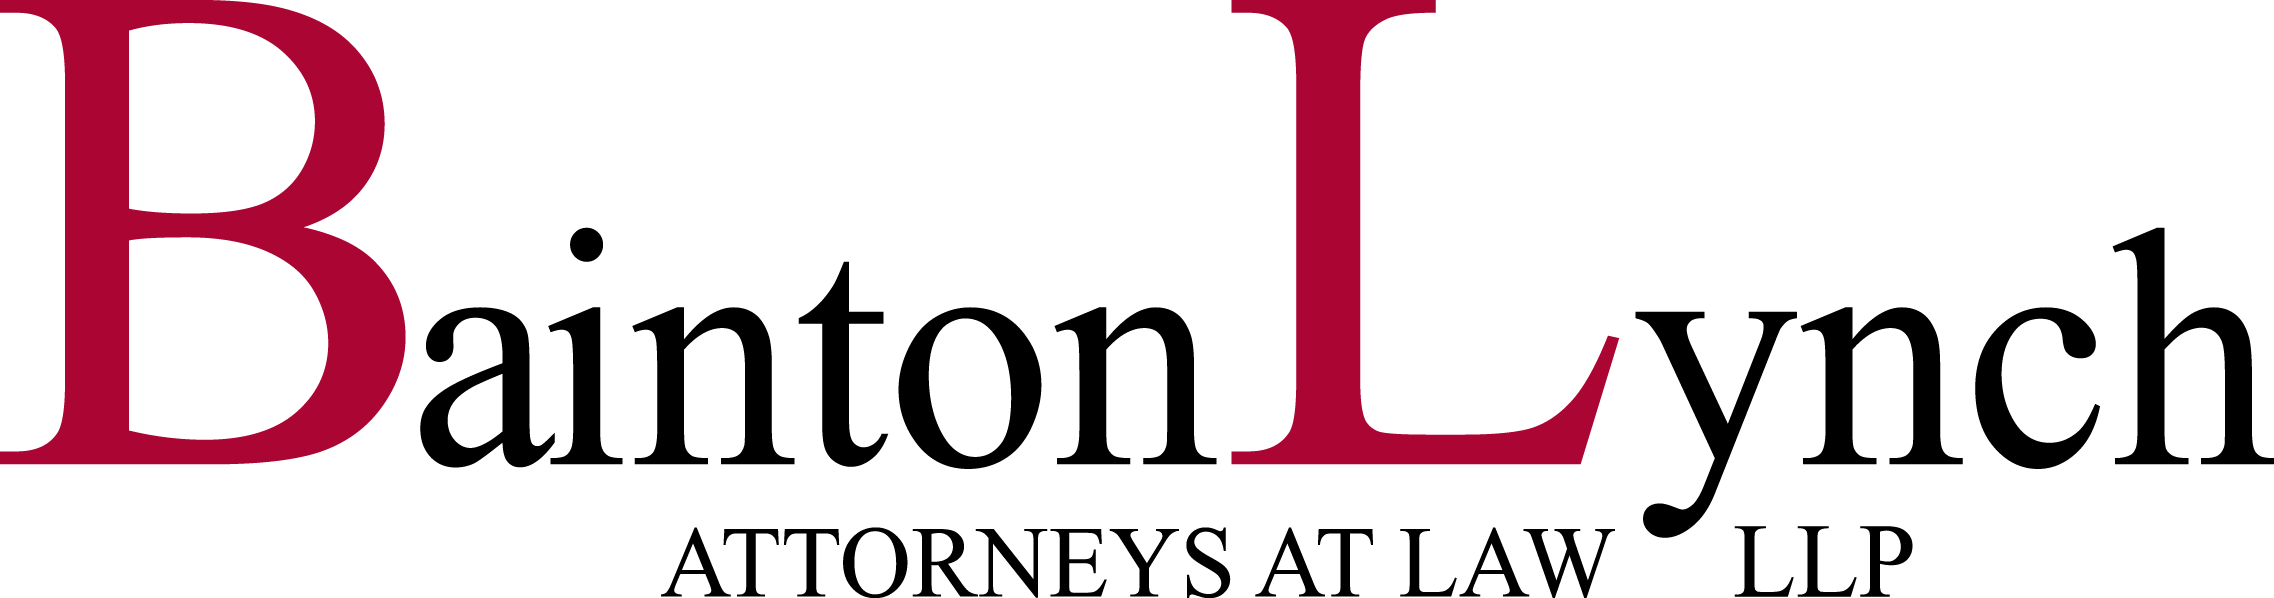 BaintonLynch - ad image